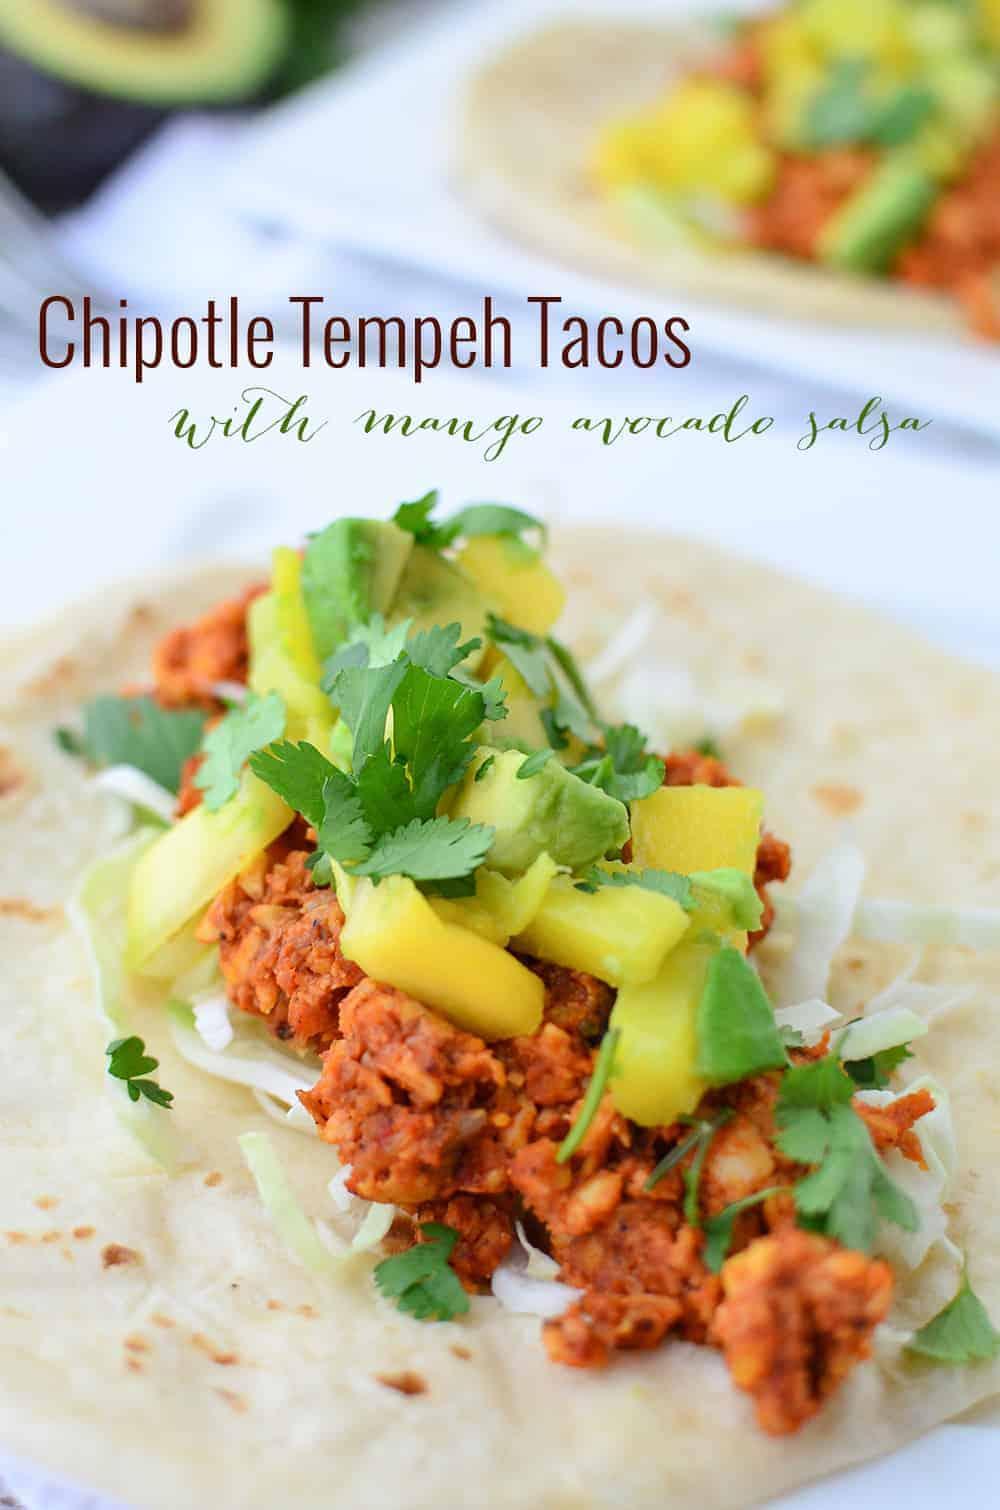 chipotle tempeh tacos delish knowledge